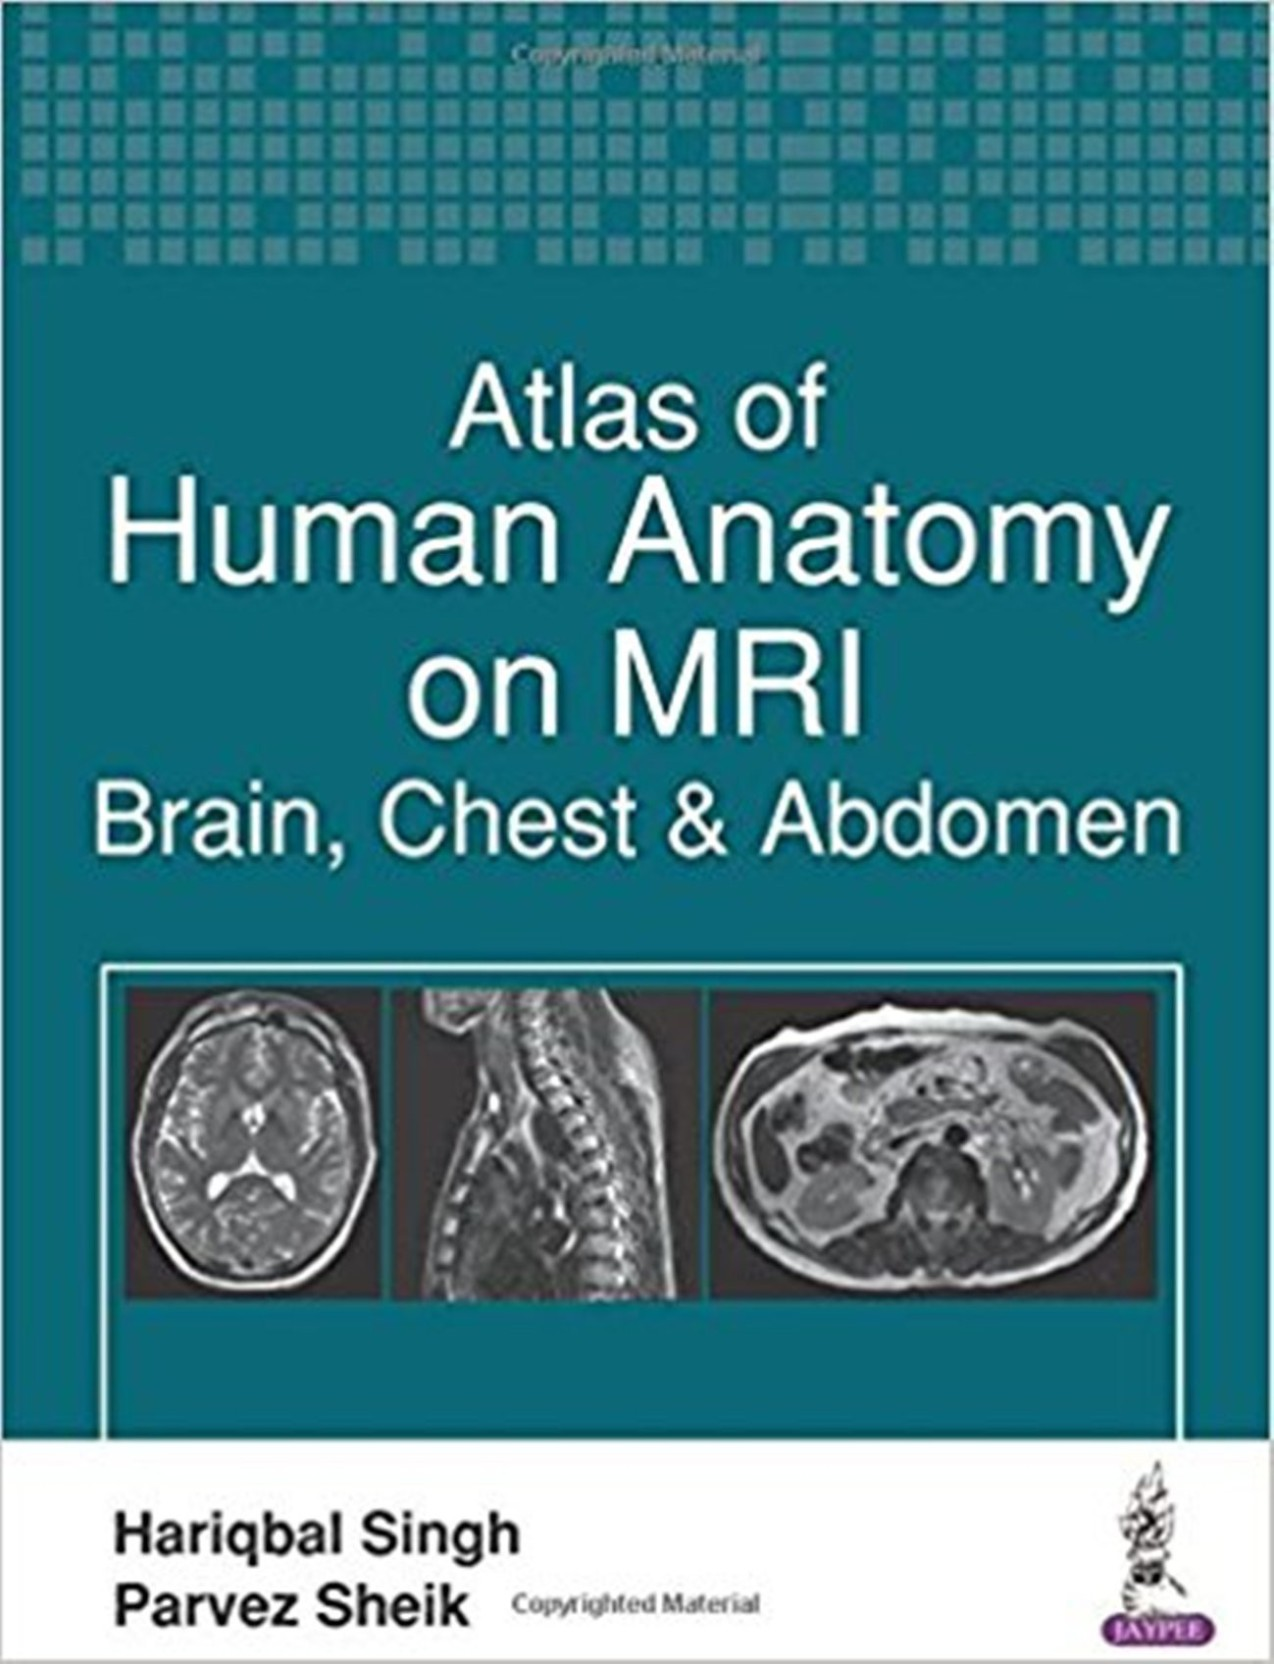 Atlas of Human Anatomy on MRI: Brain, Chest & Abdomen: Buy Atlas of ...